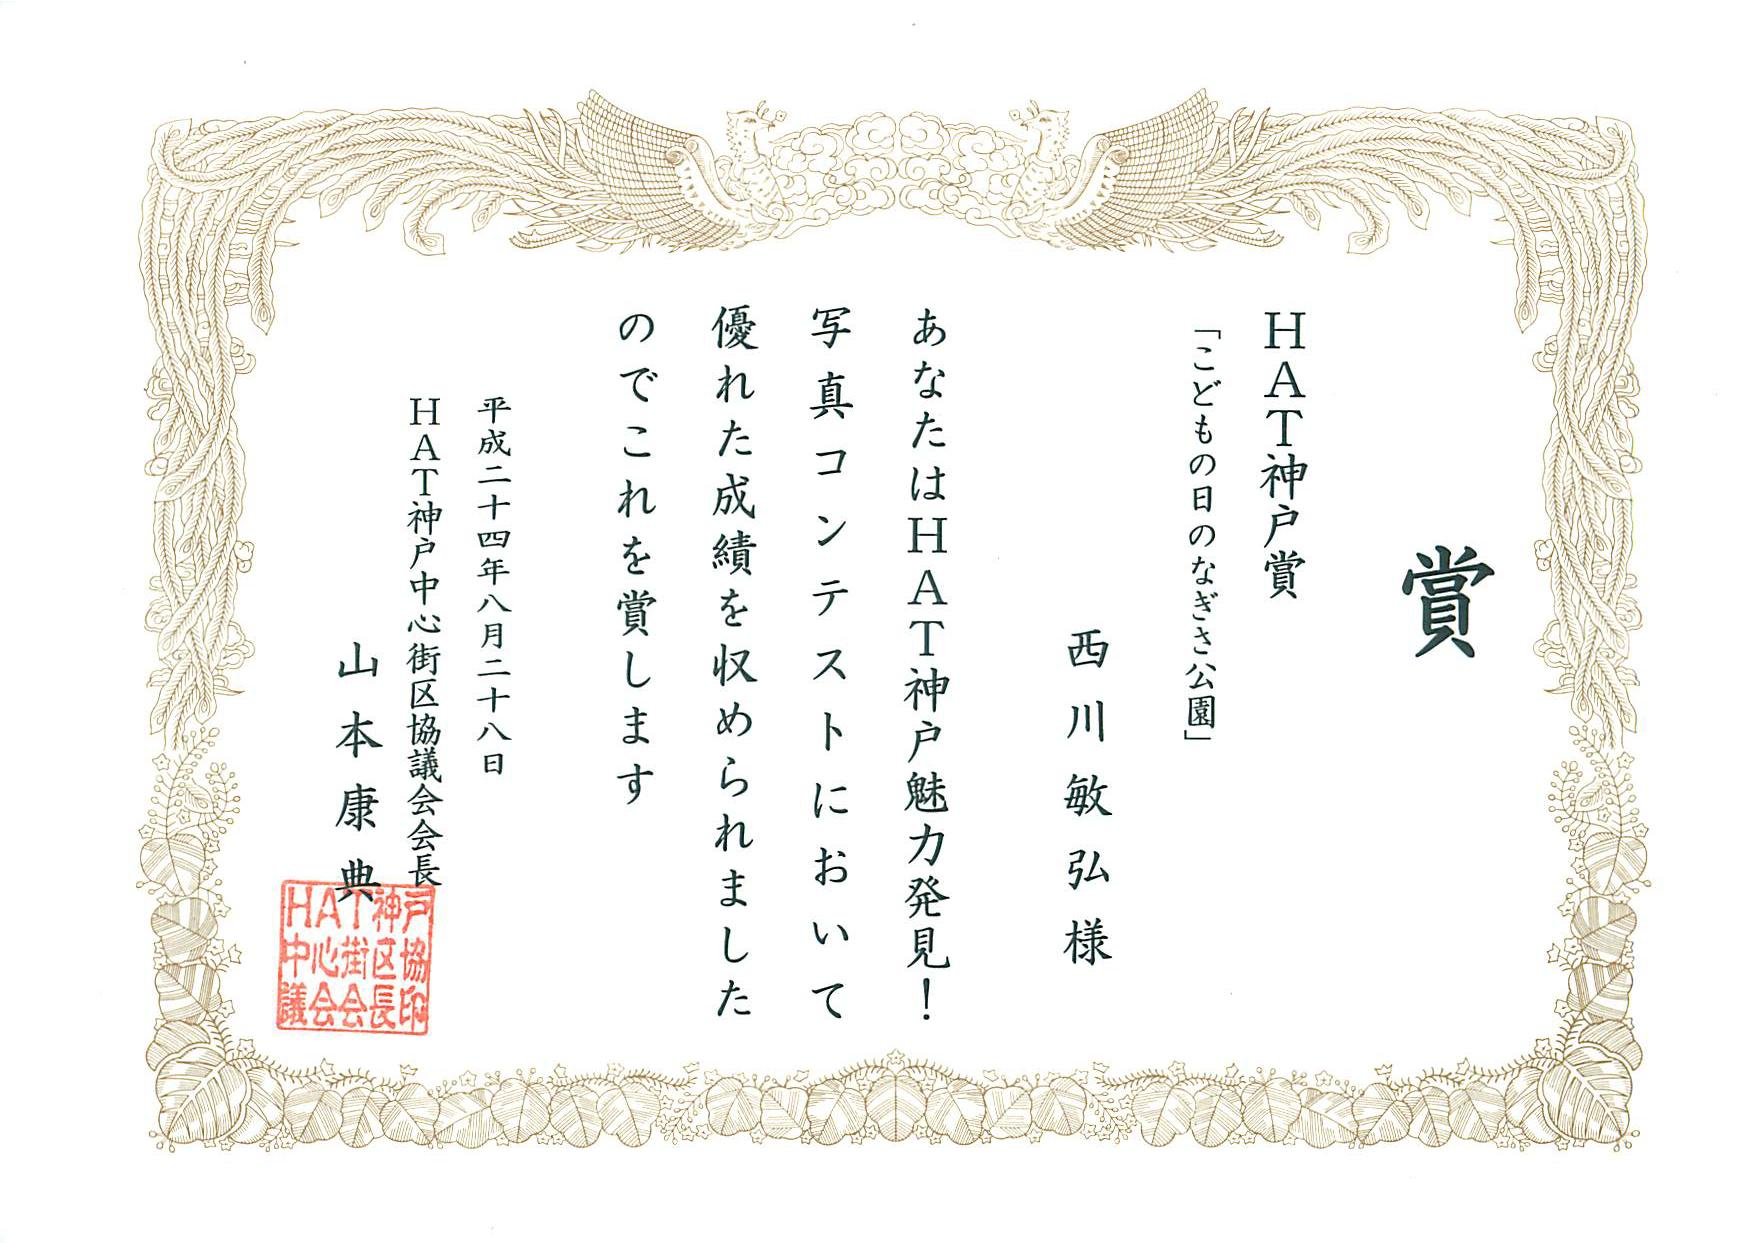 HAT神戸 魅力発見!写真コンテスト「HAT神戸賞」_a0288226_0464758.jpg